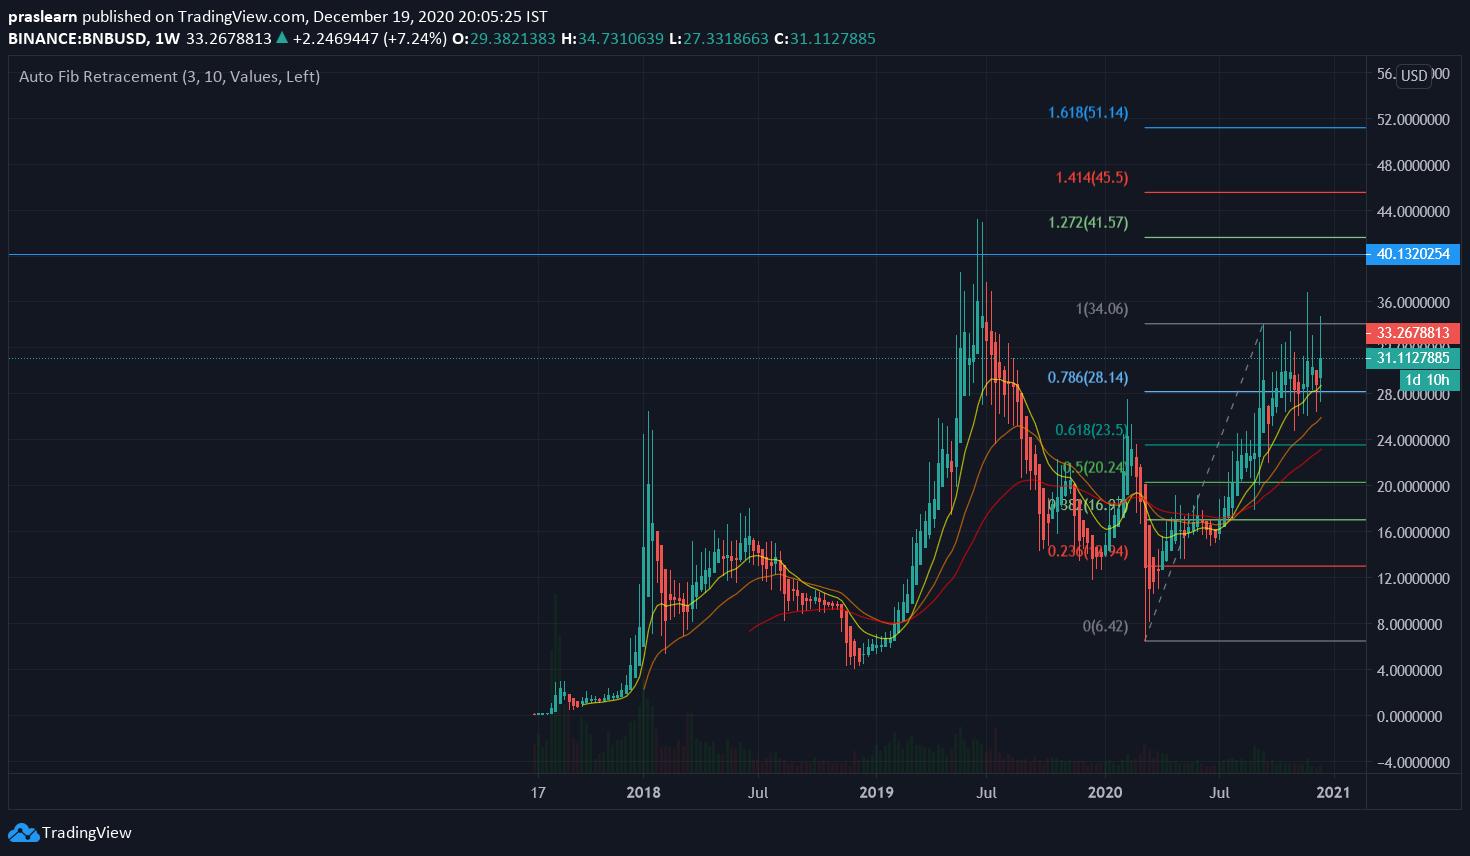 Binance Coin Price Analysis: BNB/USD 1 Week Chart: TradingView